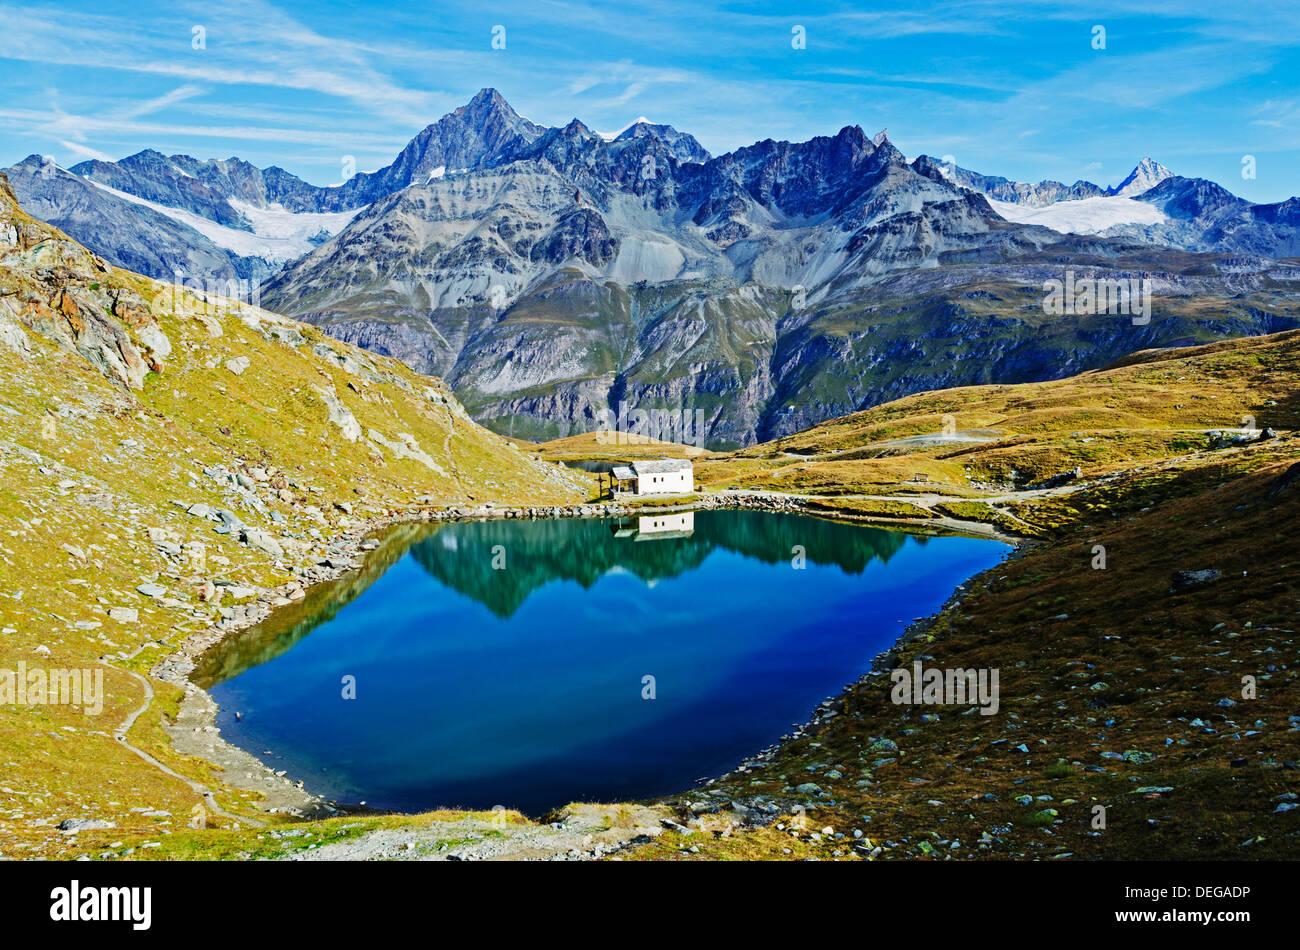 Lake at Schwarzsee paradise, Zermatt, Valais, Swiss Alps, Switzerland, Europe - Stock Image